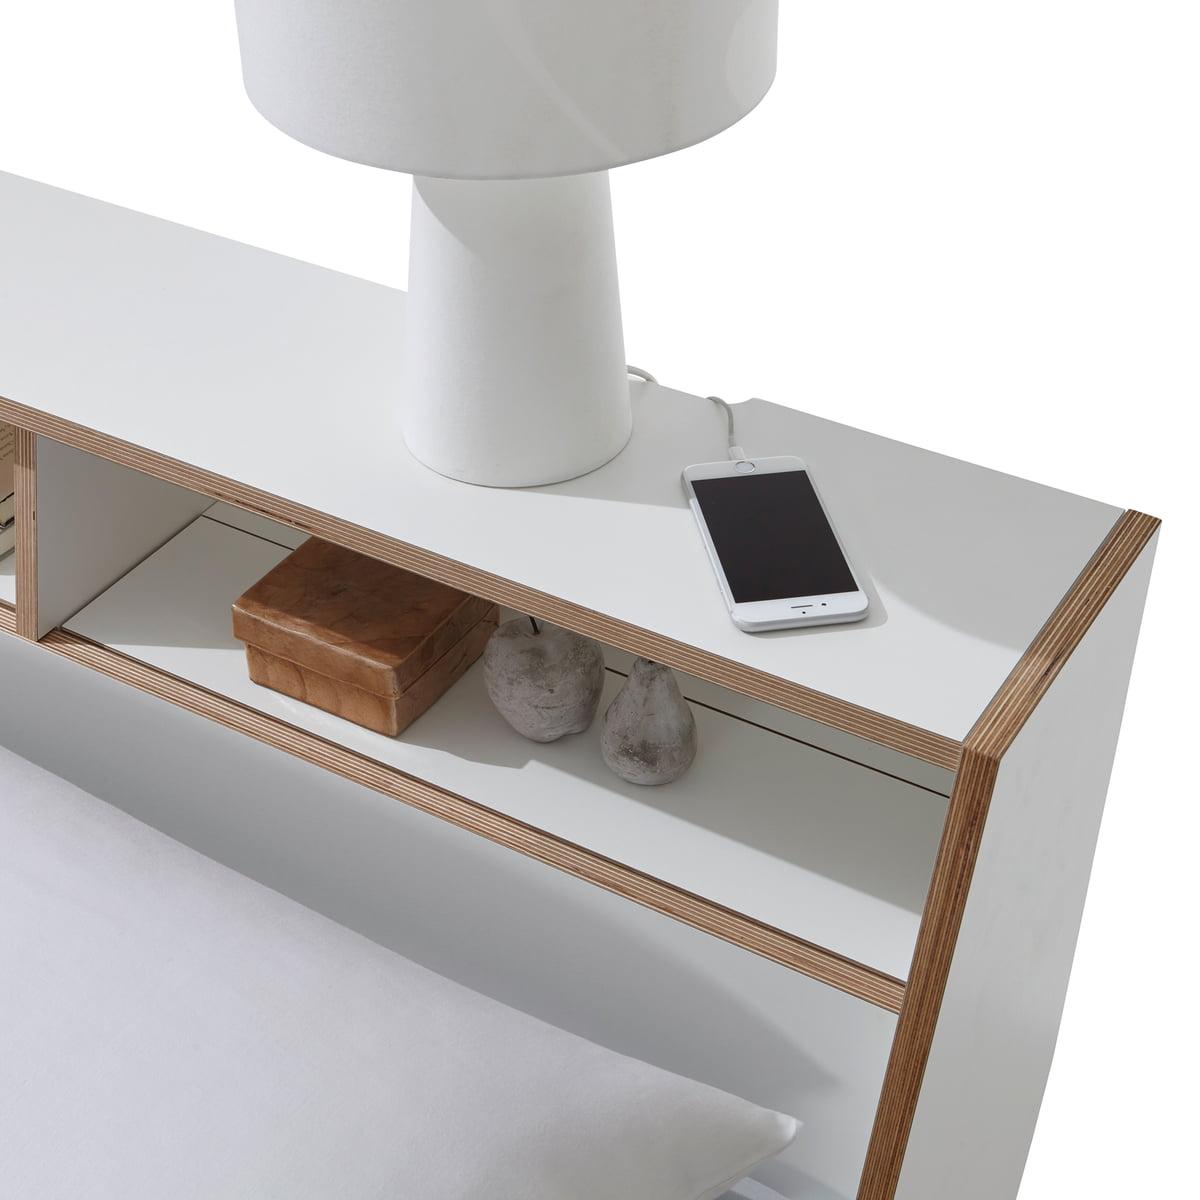 Slope Bett Von Muller Mobelwerkstatten Shop